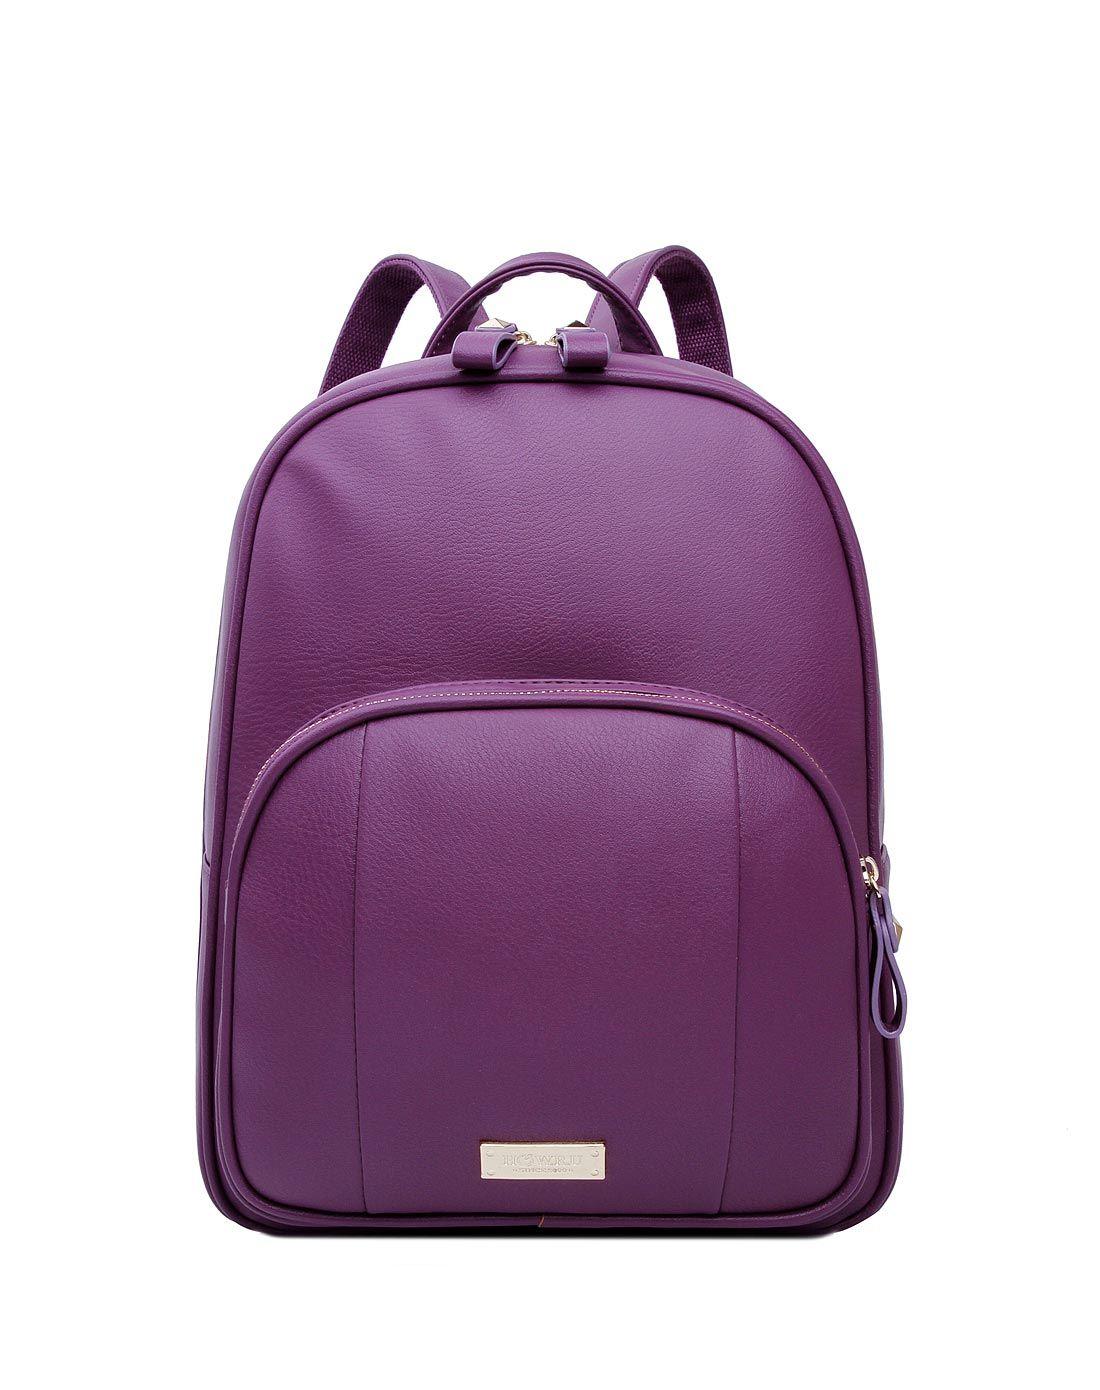 r.u女款紫色时尚简约纯色双肩包6ei070